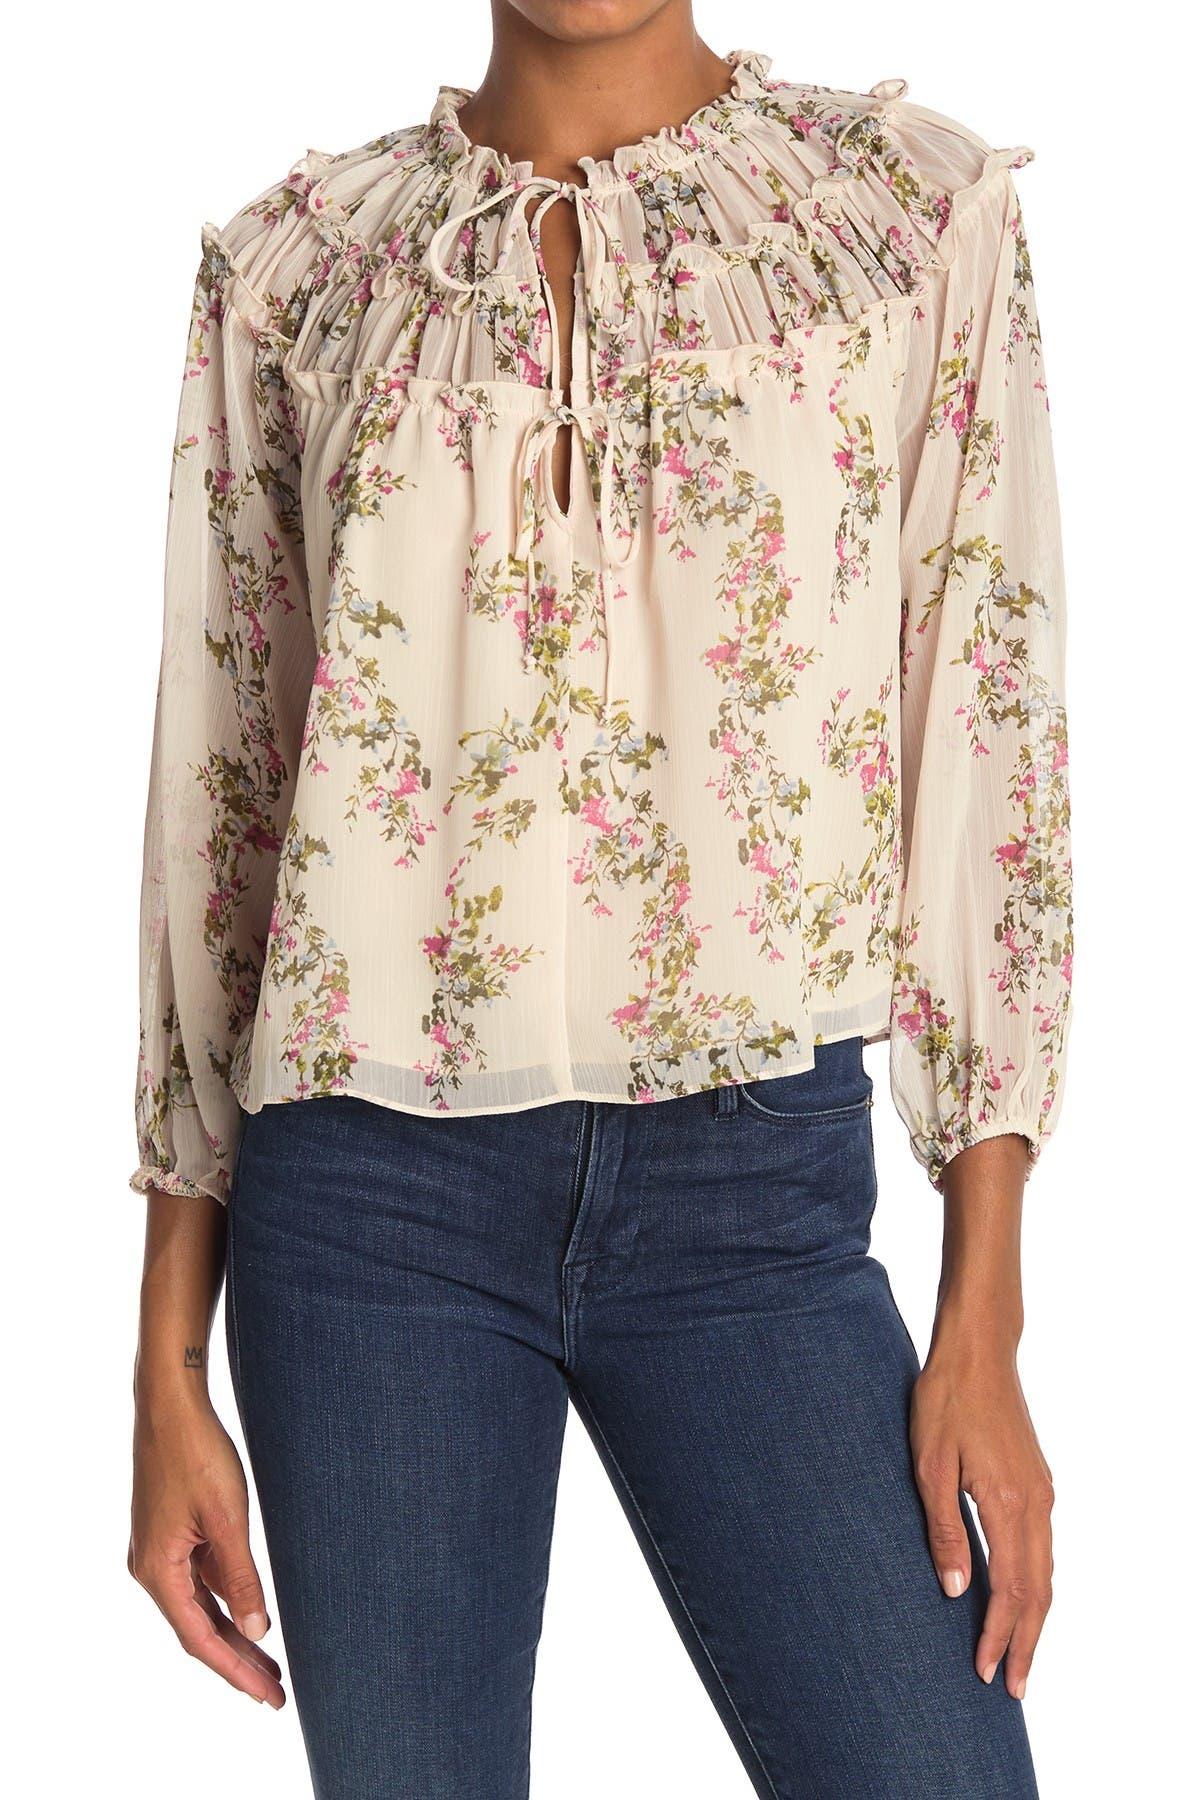 Image of Socialite Tie Neck Floral Print Blouse